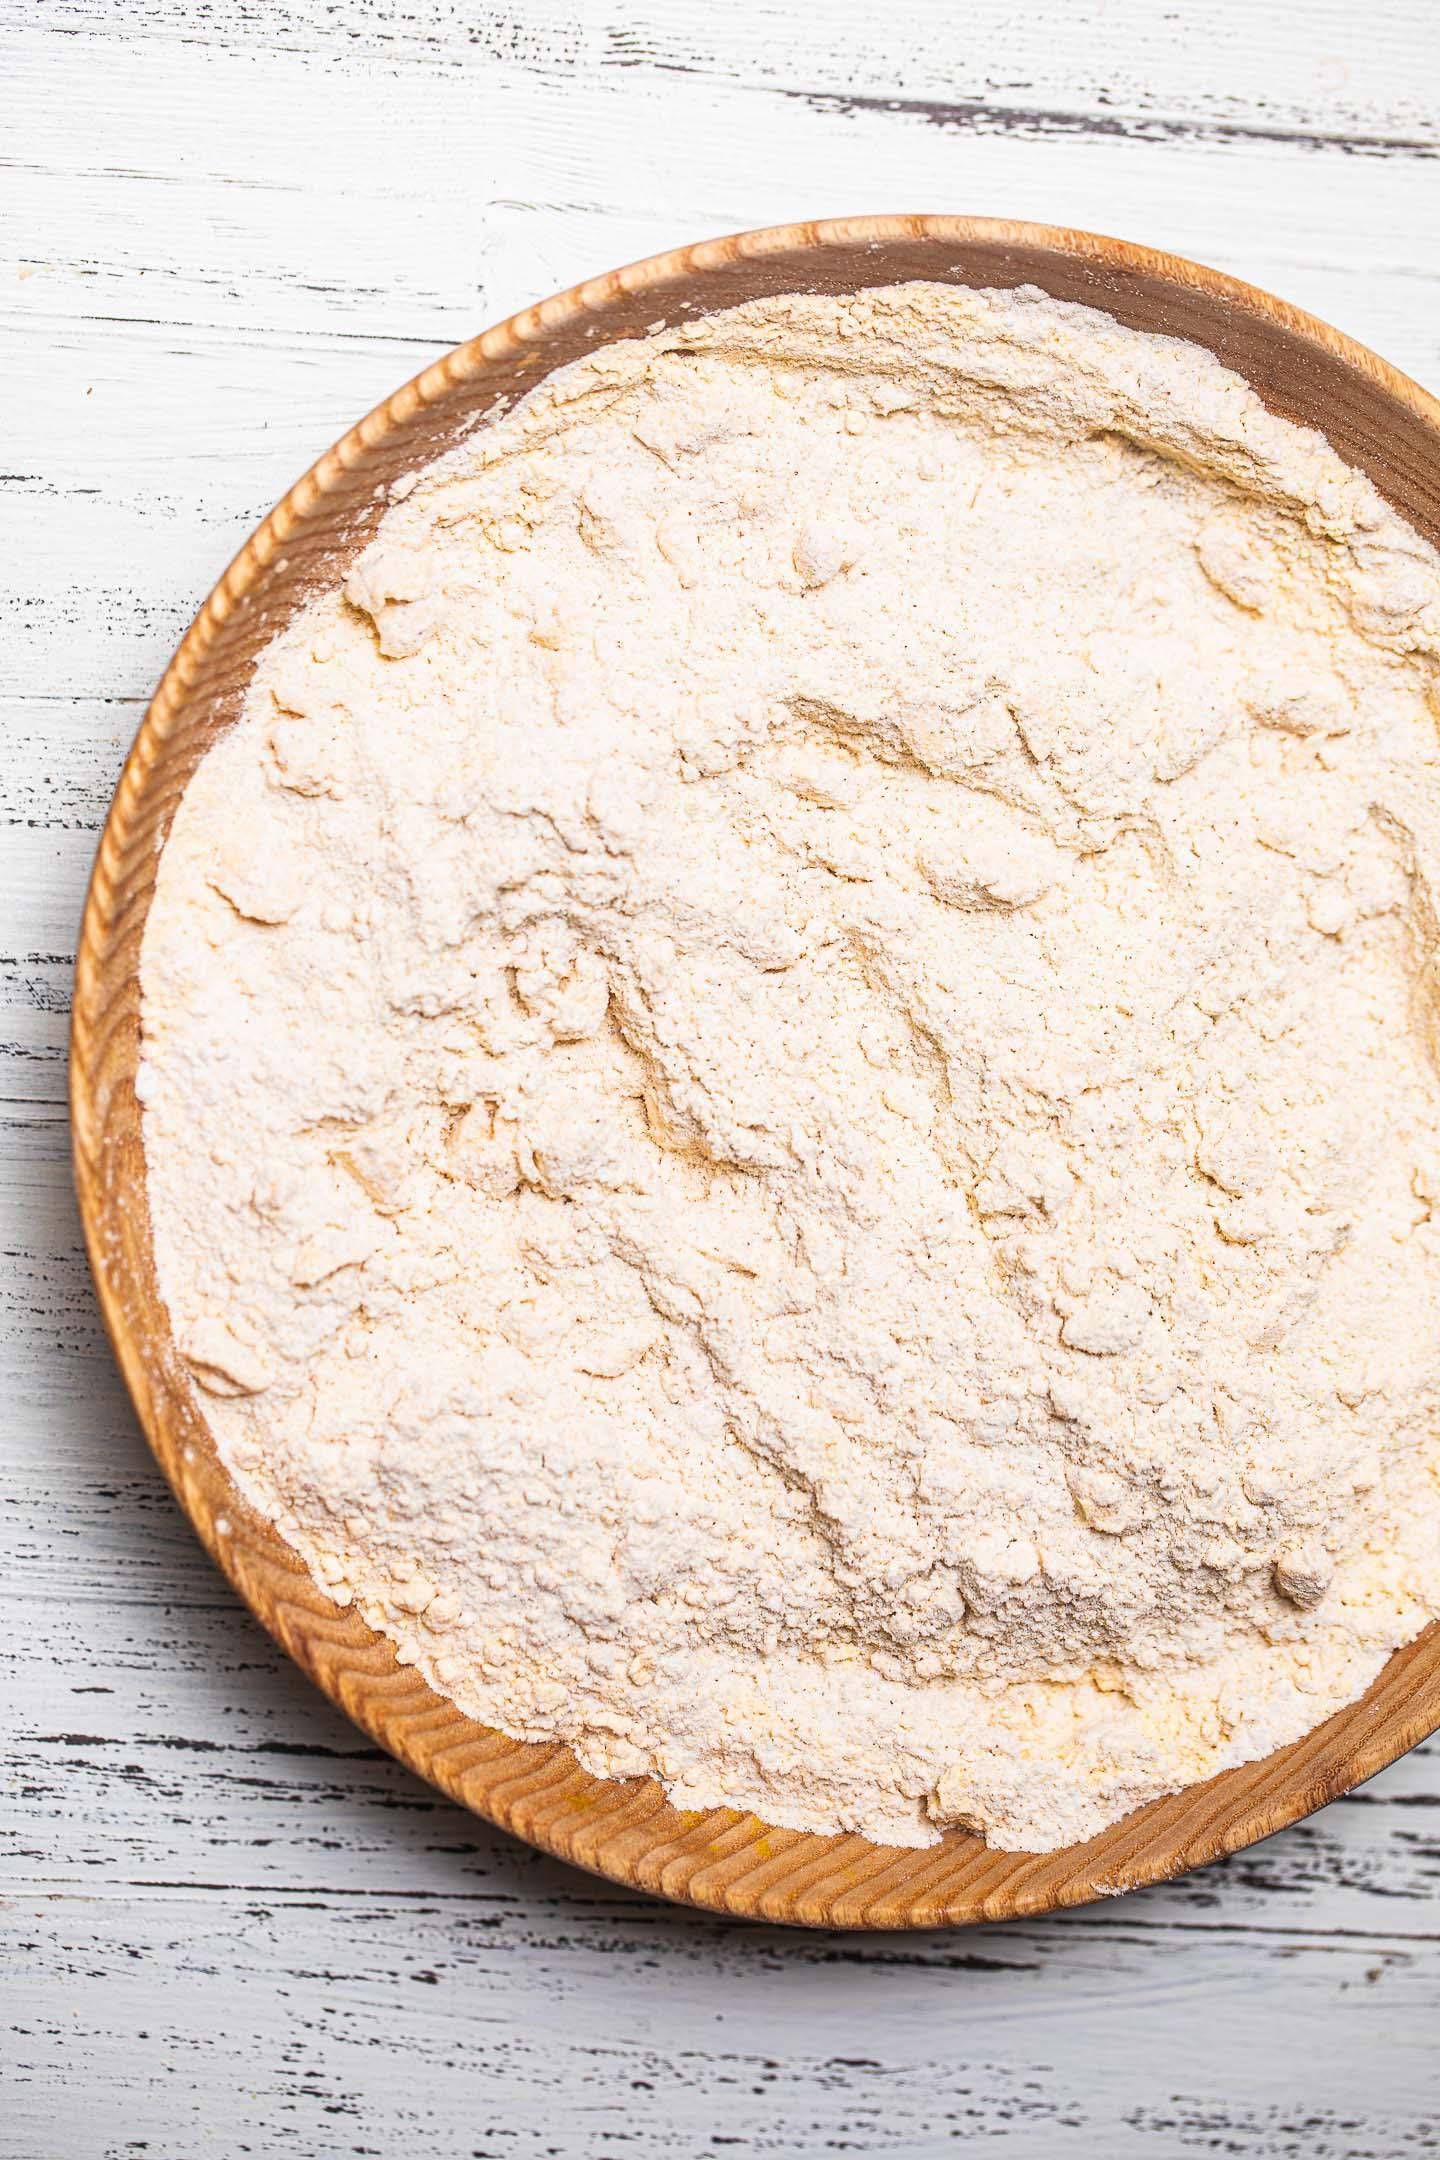 Dry ingredients for a gluten-free vegan crust